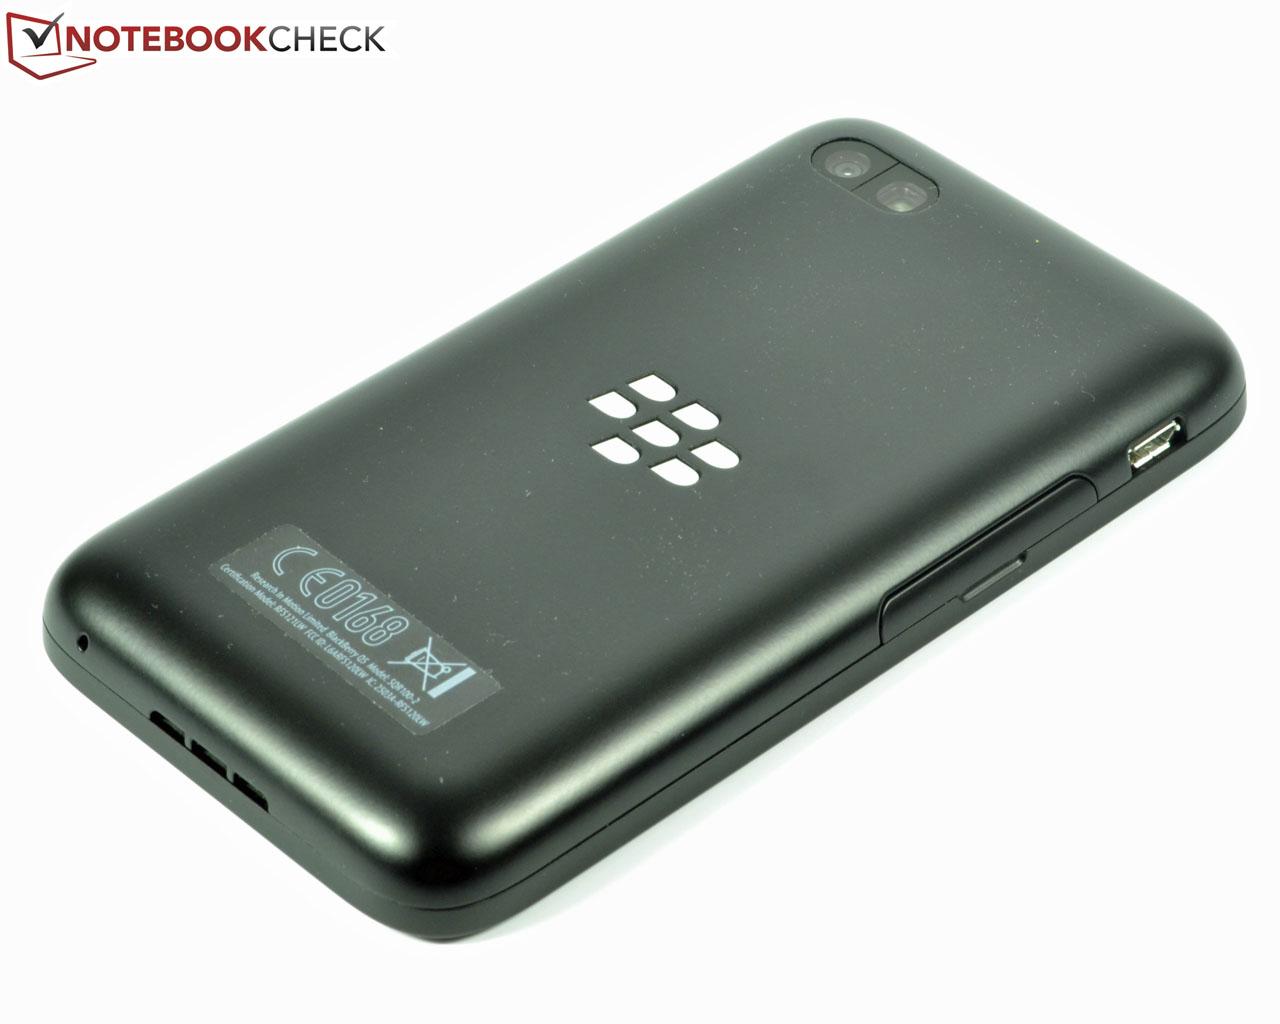 Review BlackBerry Q5 Smartphone